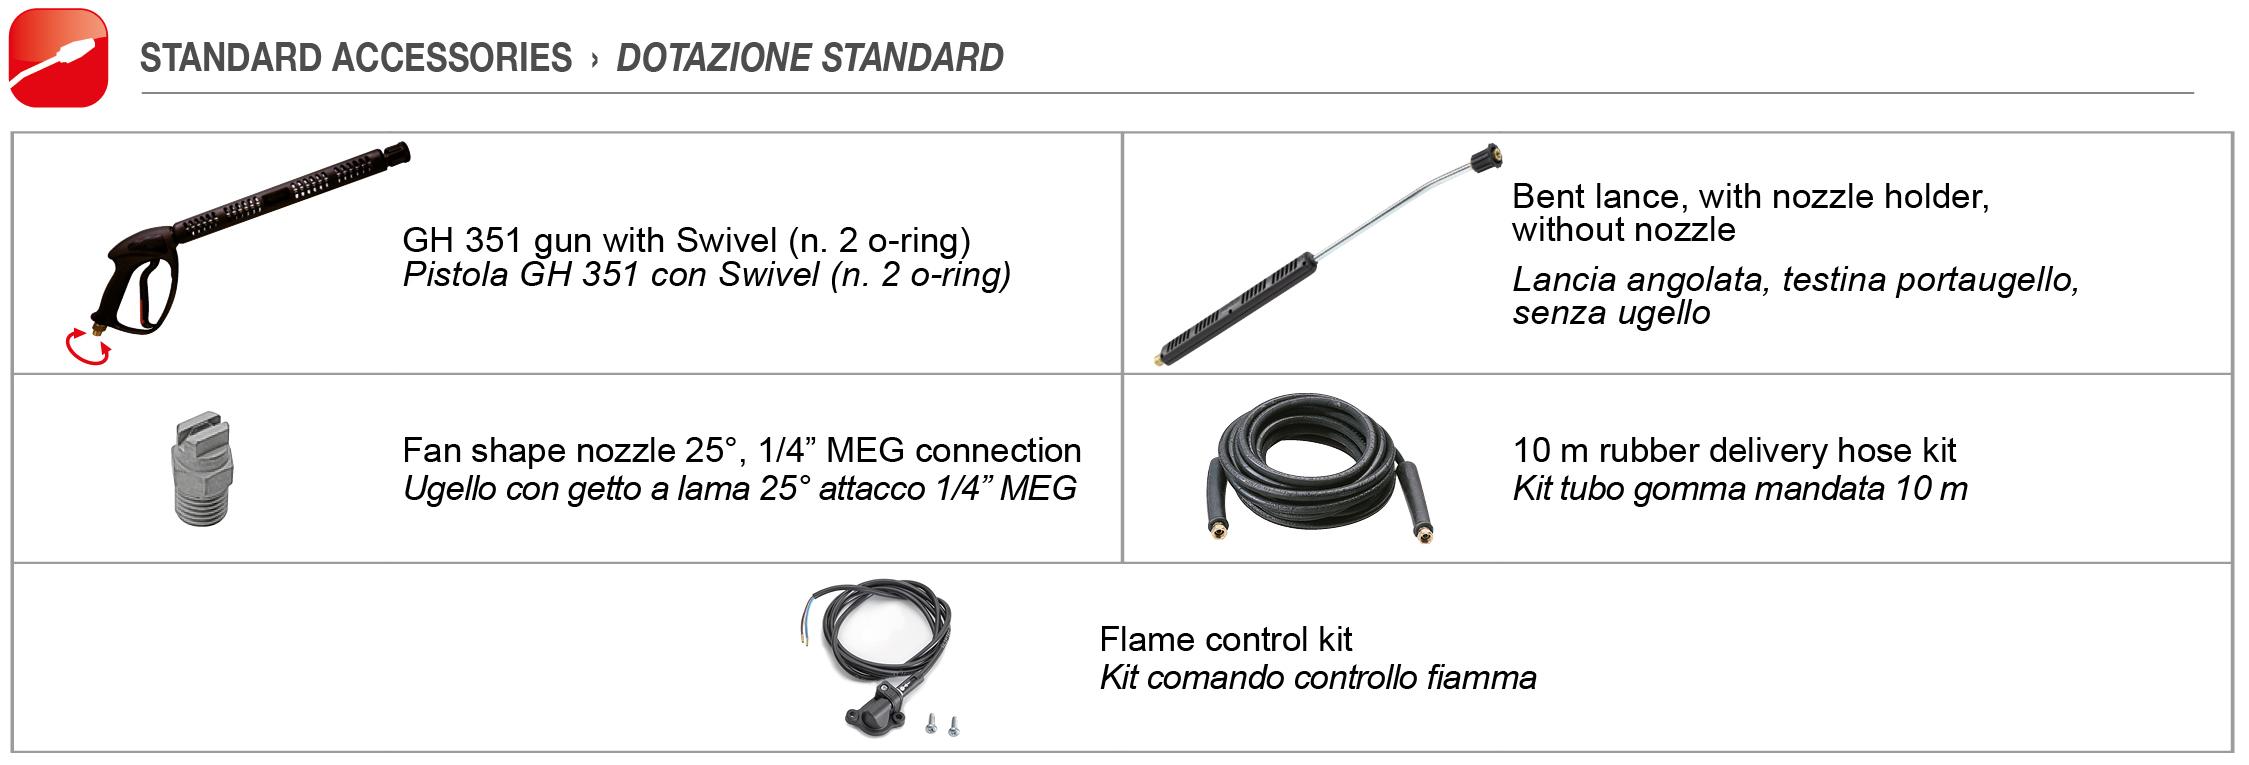 KM Extra - Accessories Comet